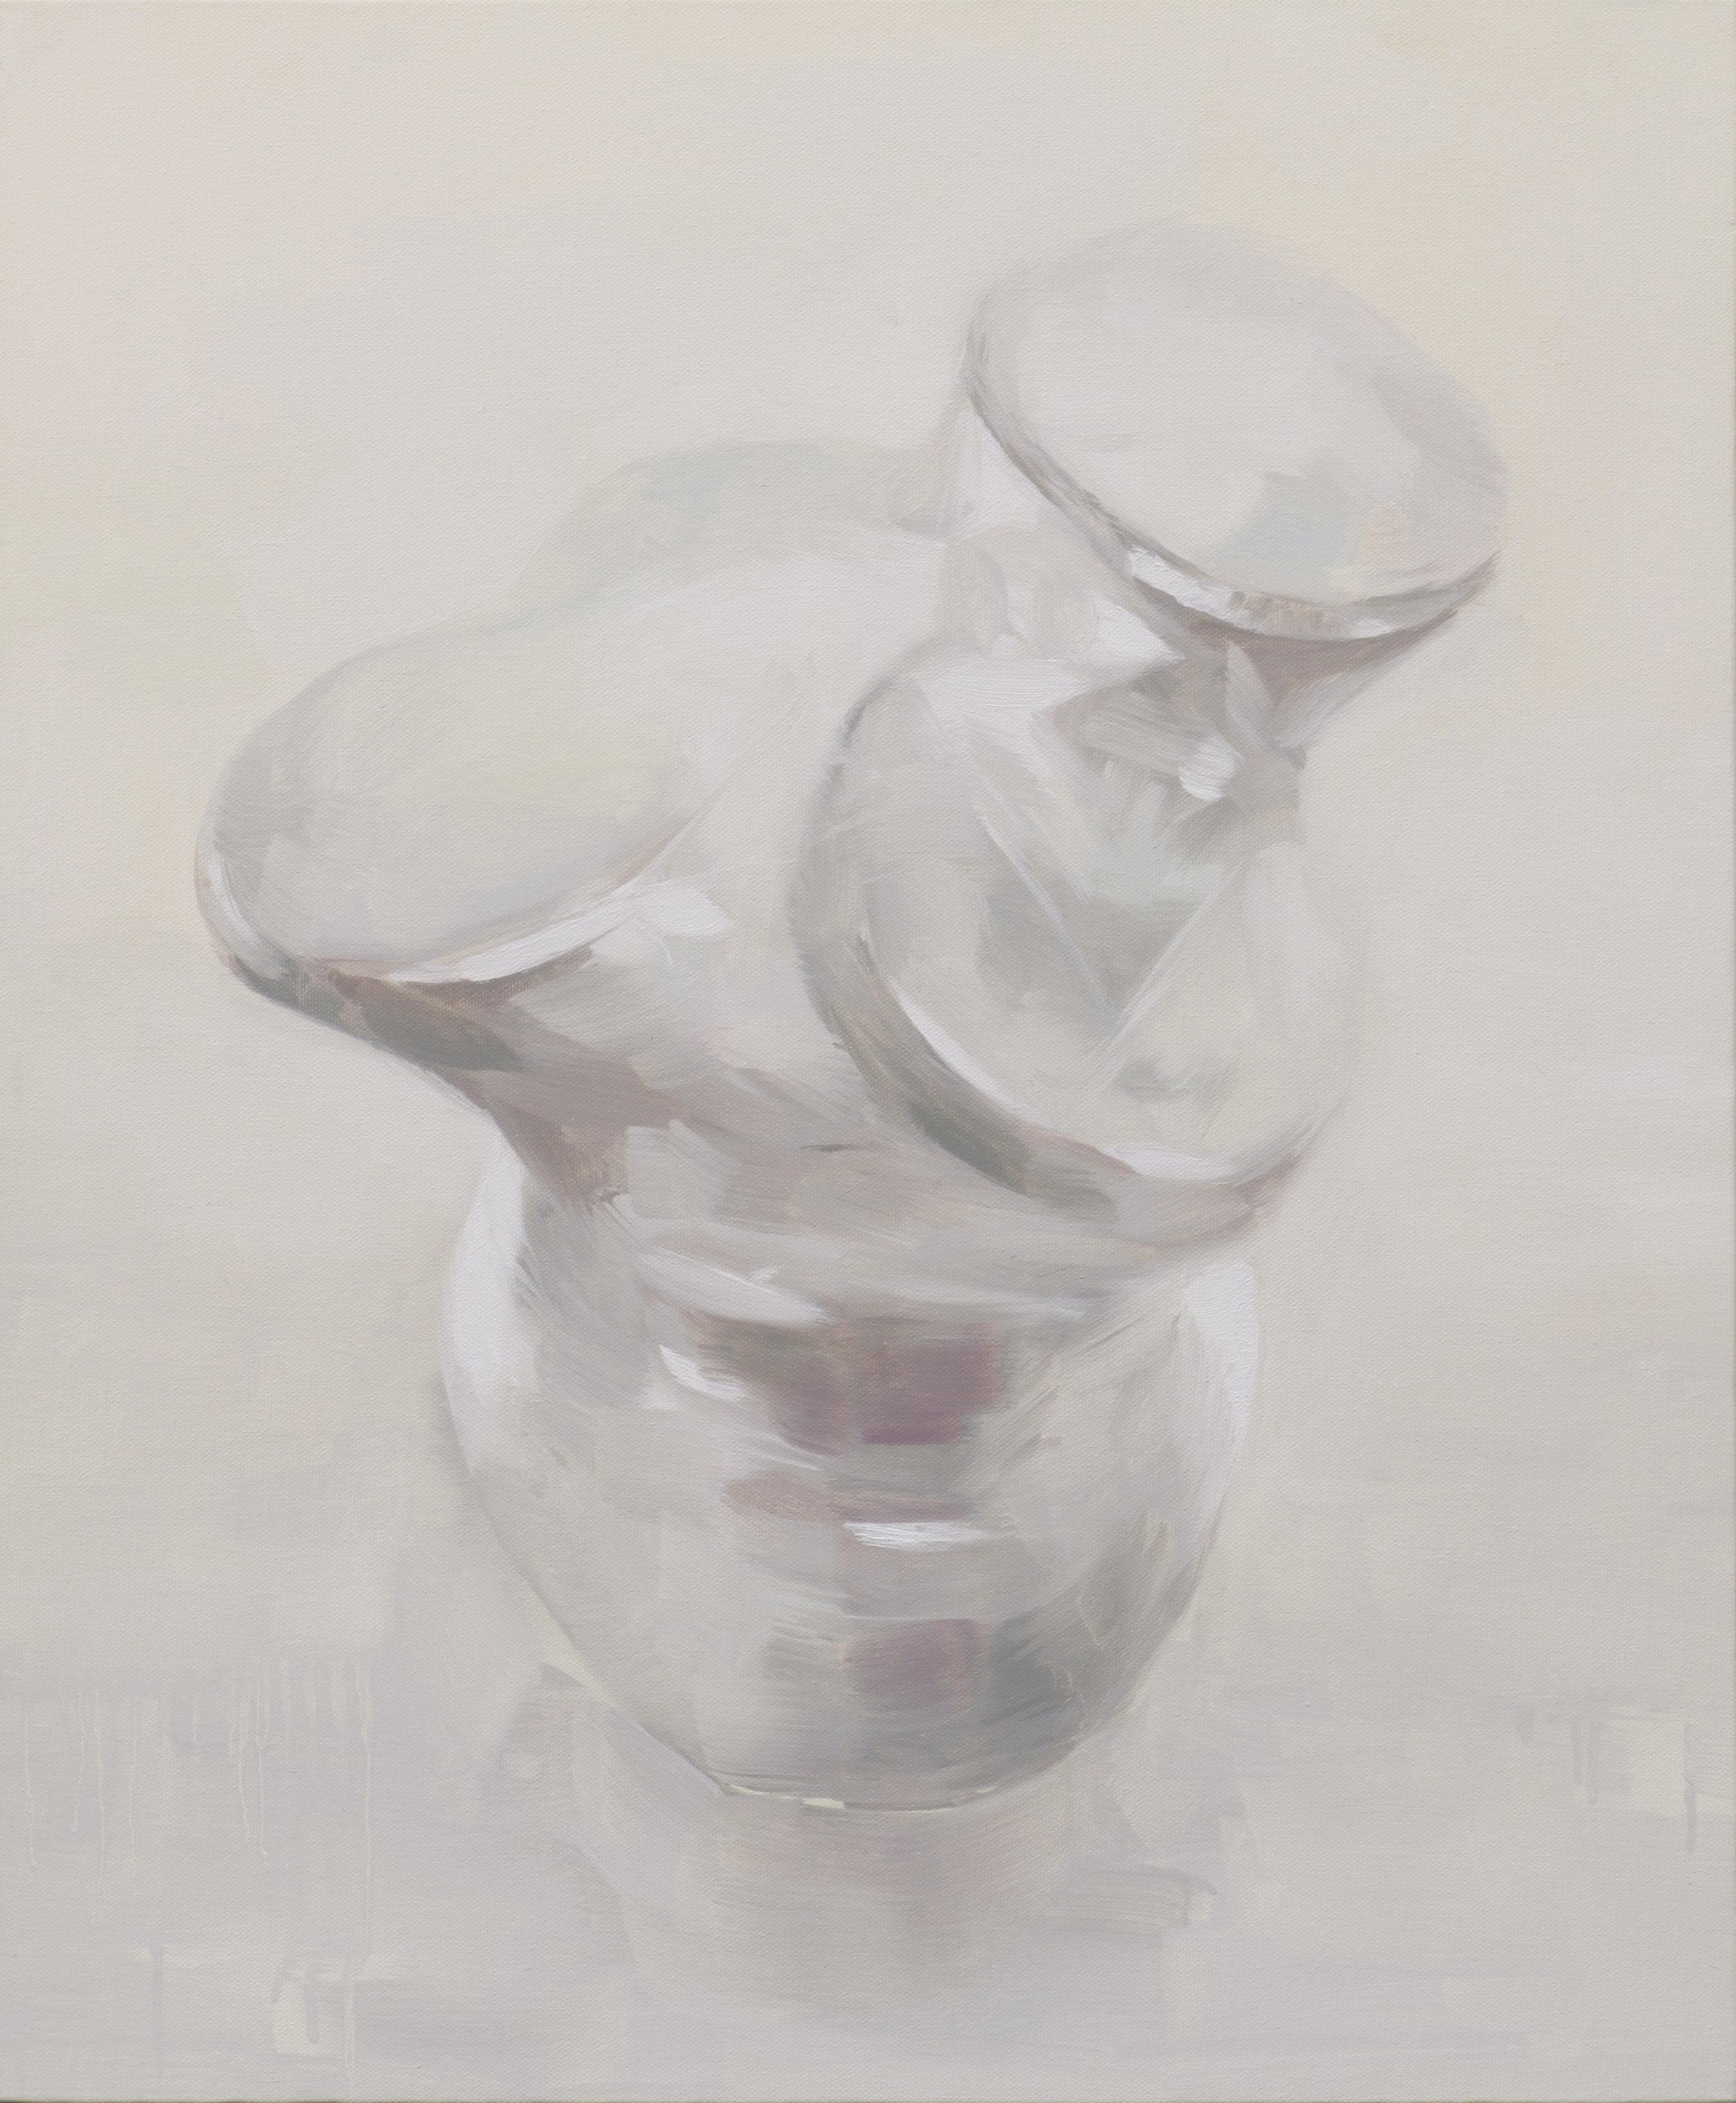 SH1813_Hong Soun_OrdinaryMonument M-1813_oil on canvas_52.5x41cm_2018.jpg